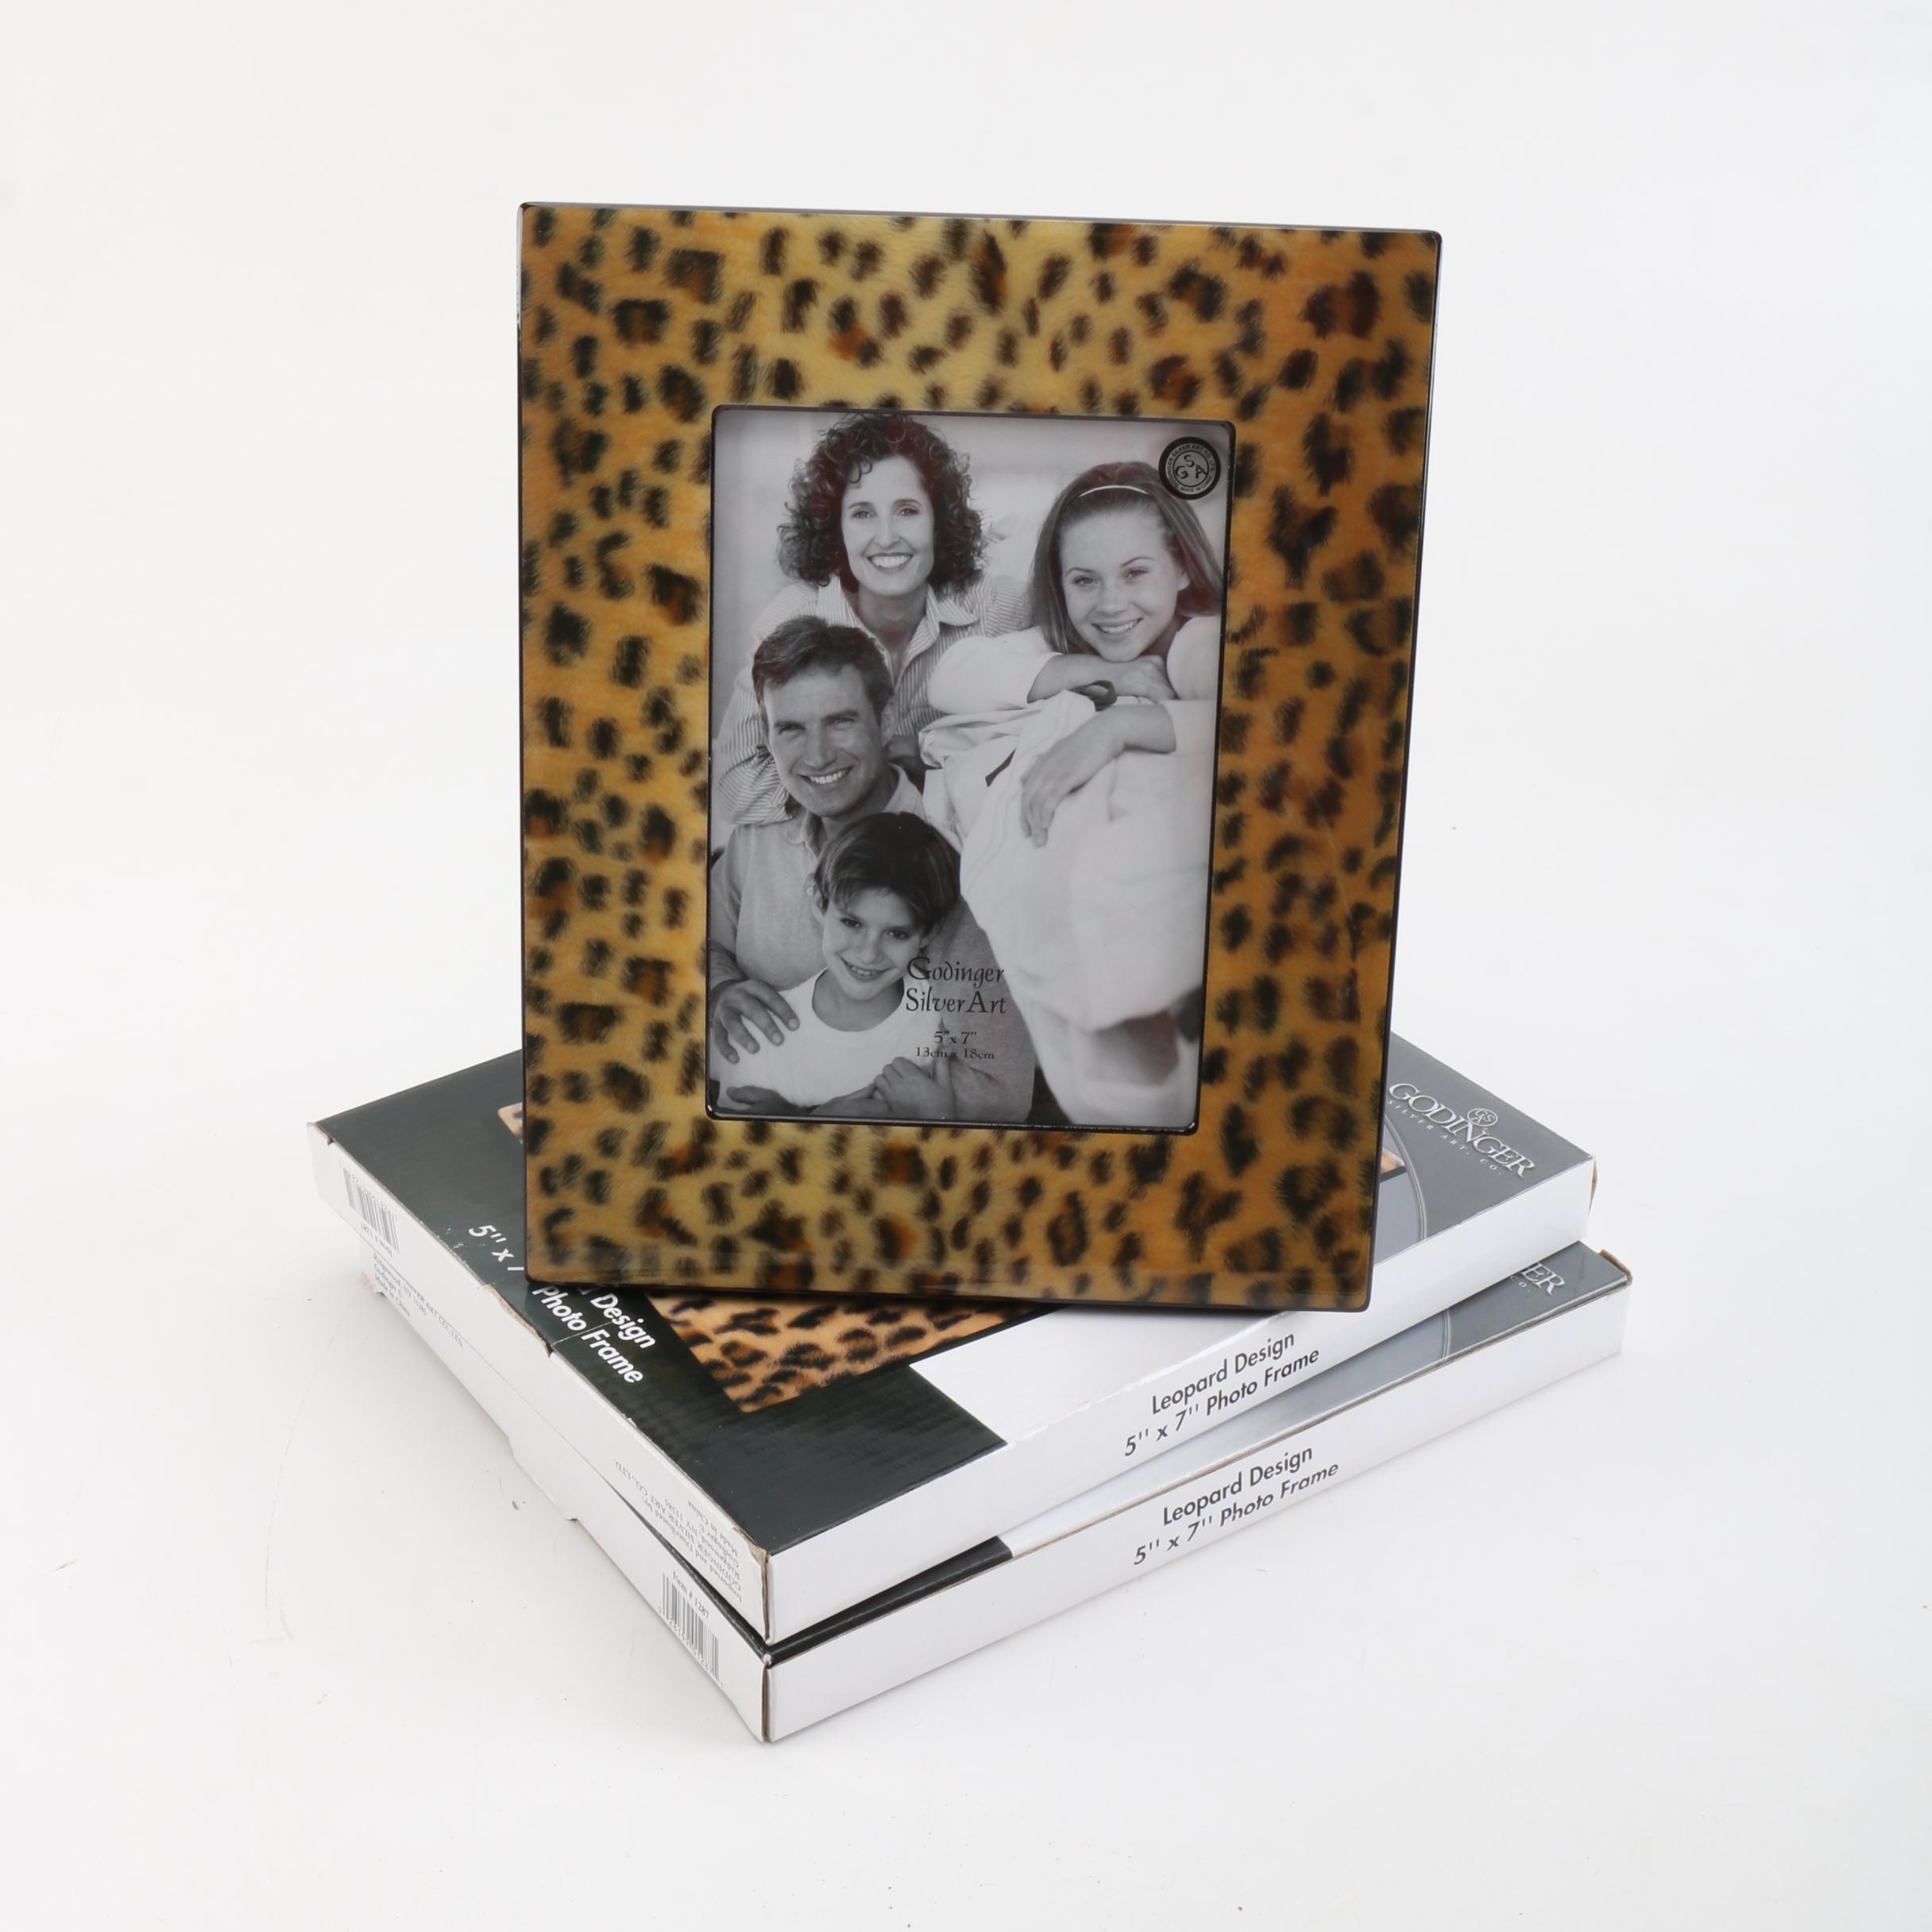 Leopard Motif Picture Frames by Godinger